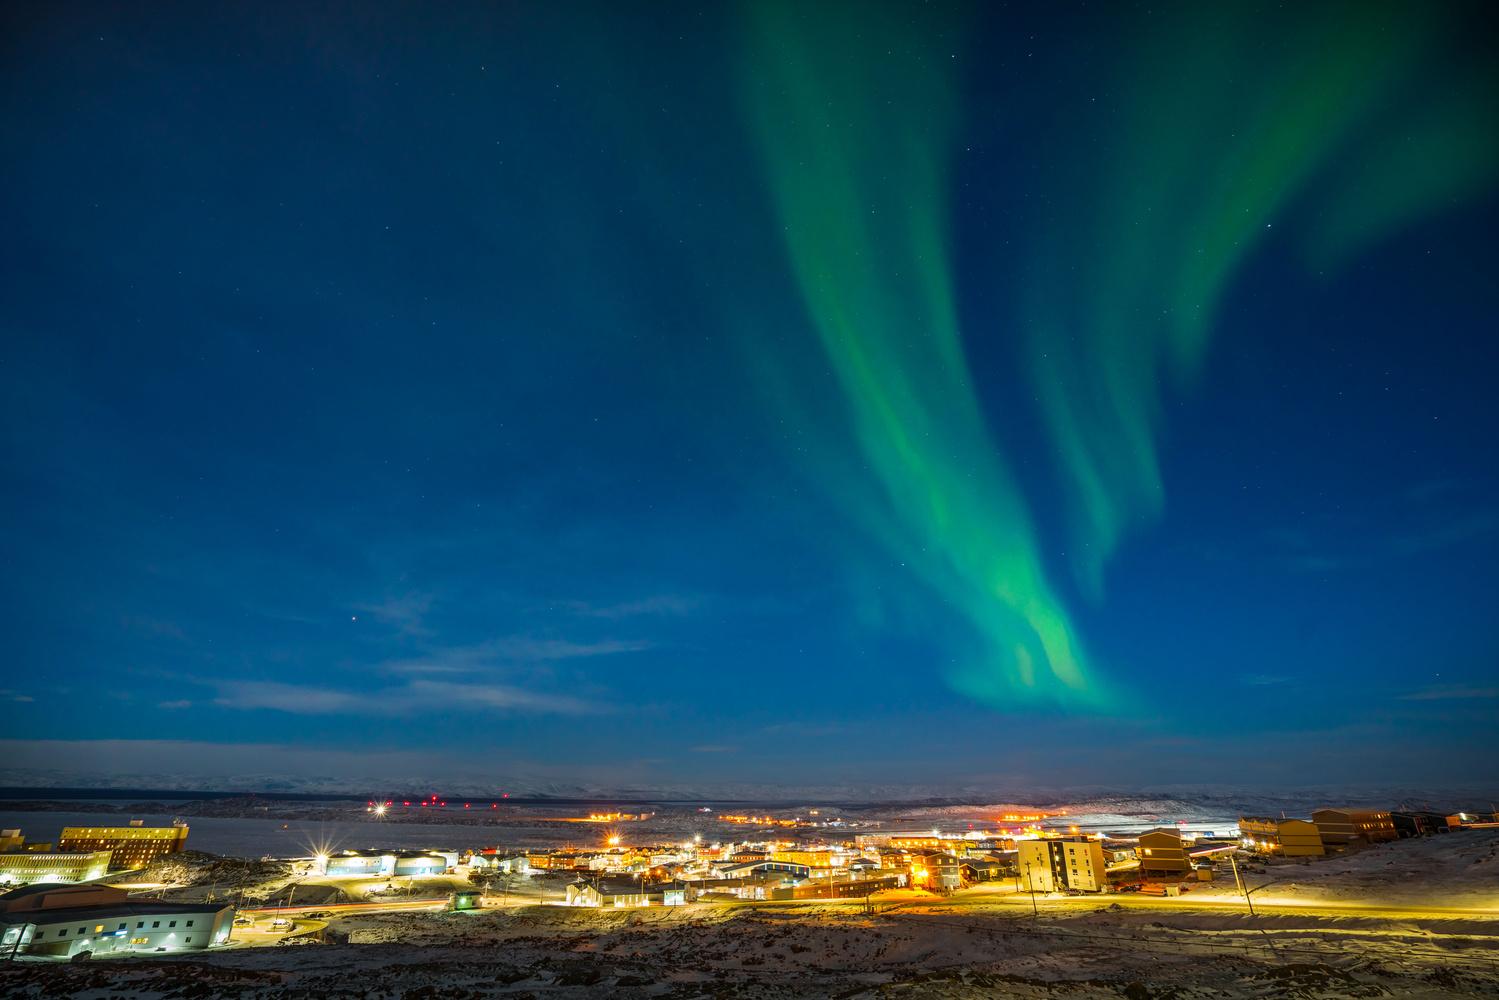 Arctic City Lights by Bill Williams